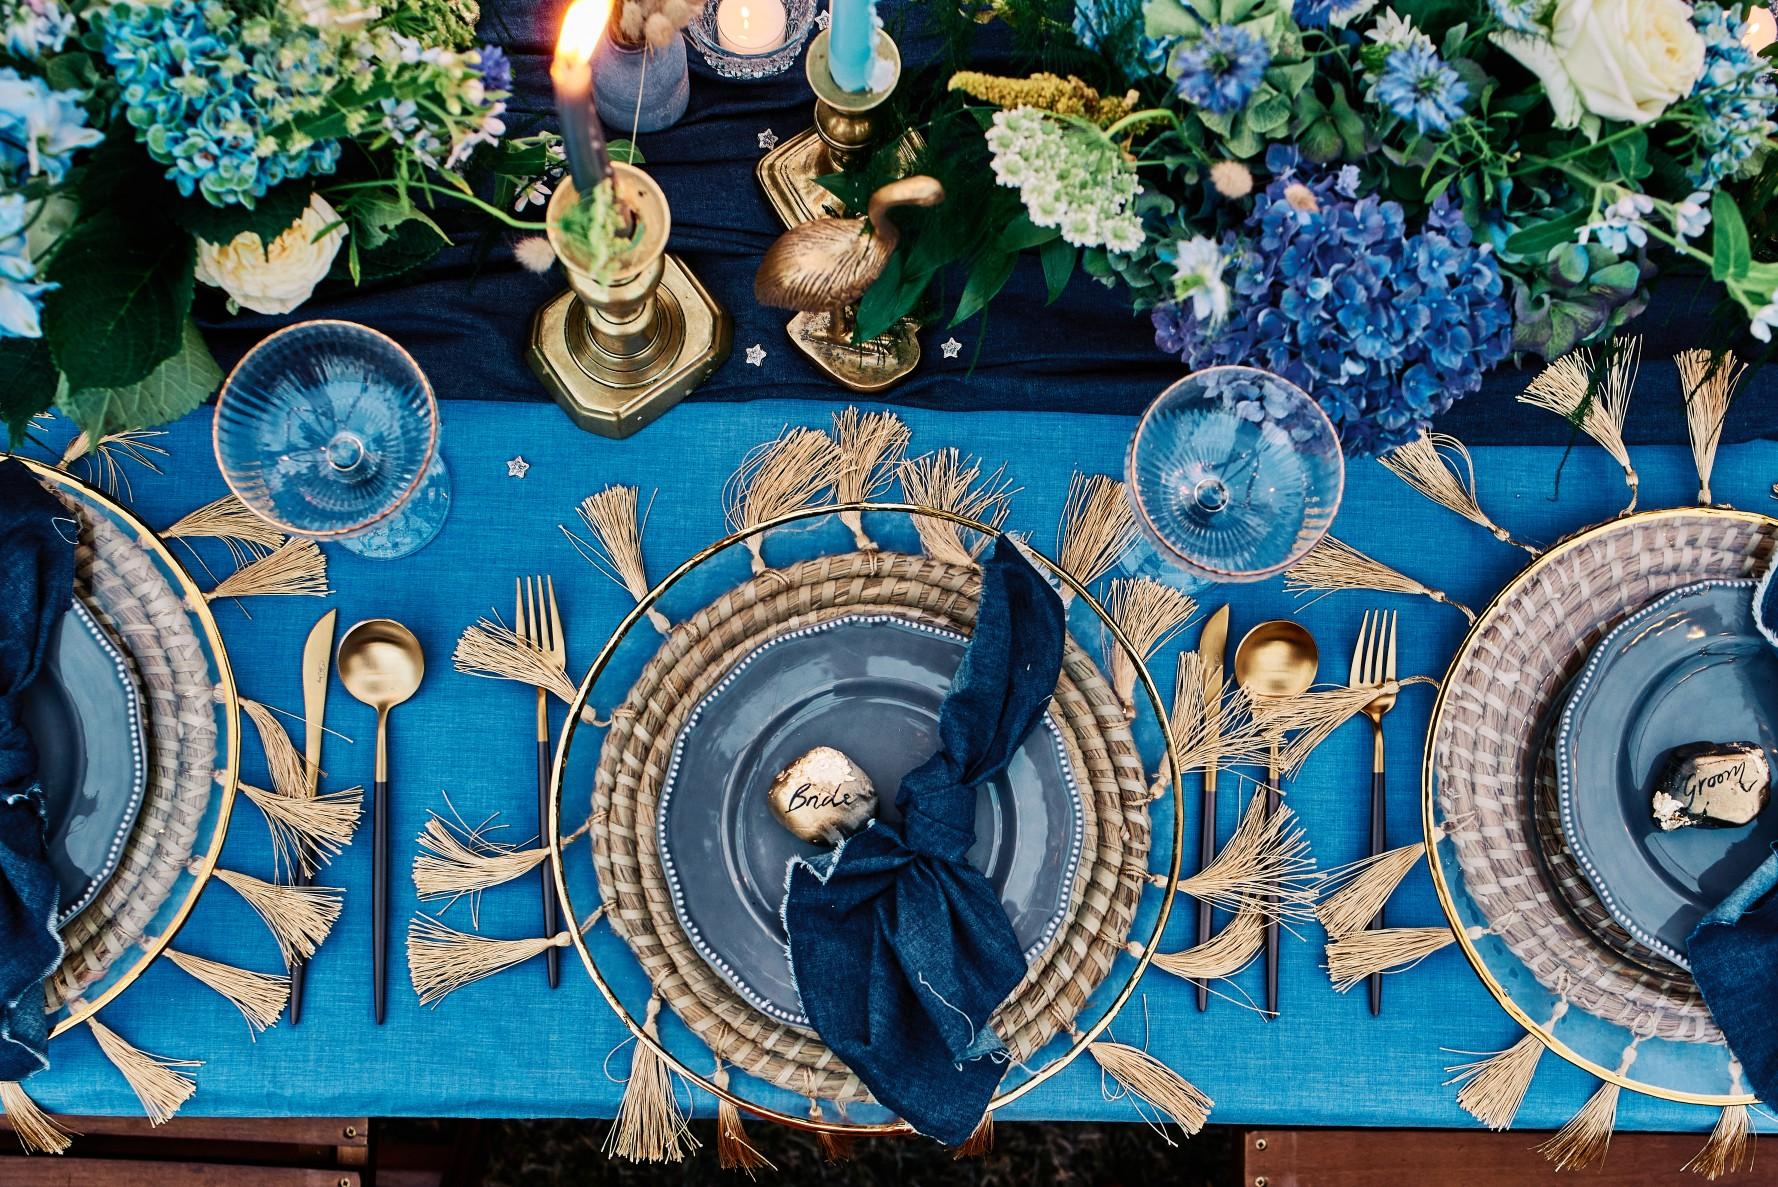 nhs wedding - paramedic wedding - blue and gold wedding - outdoor wedding - micro wedding - surprise wedding - bohemian wedding table styling